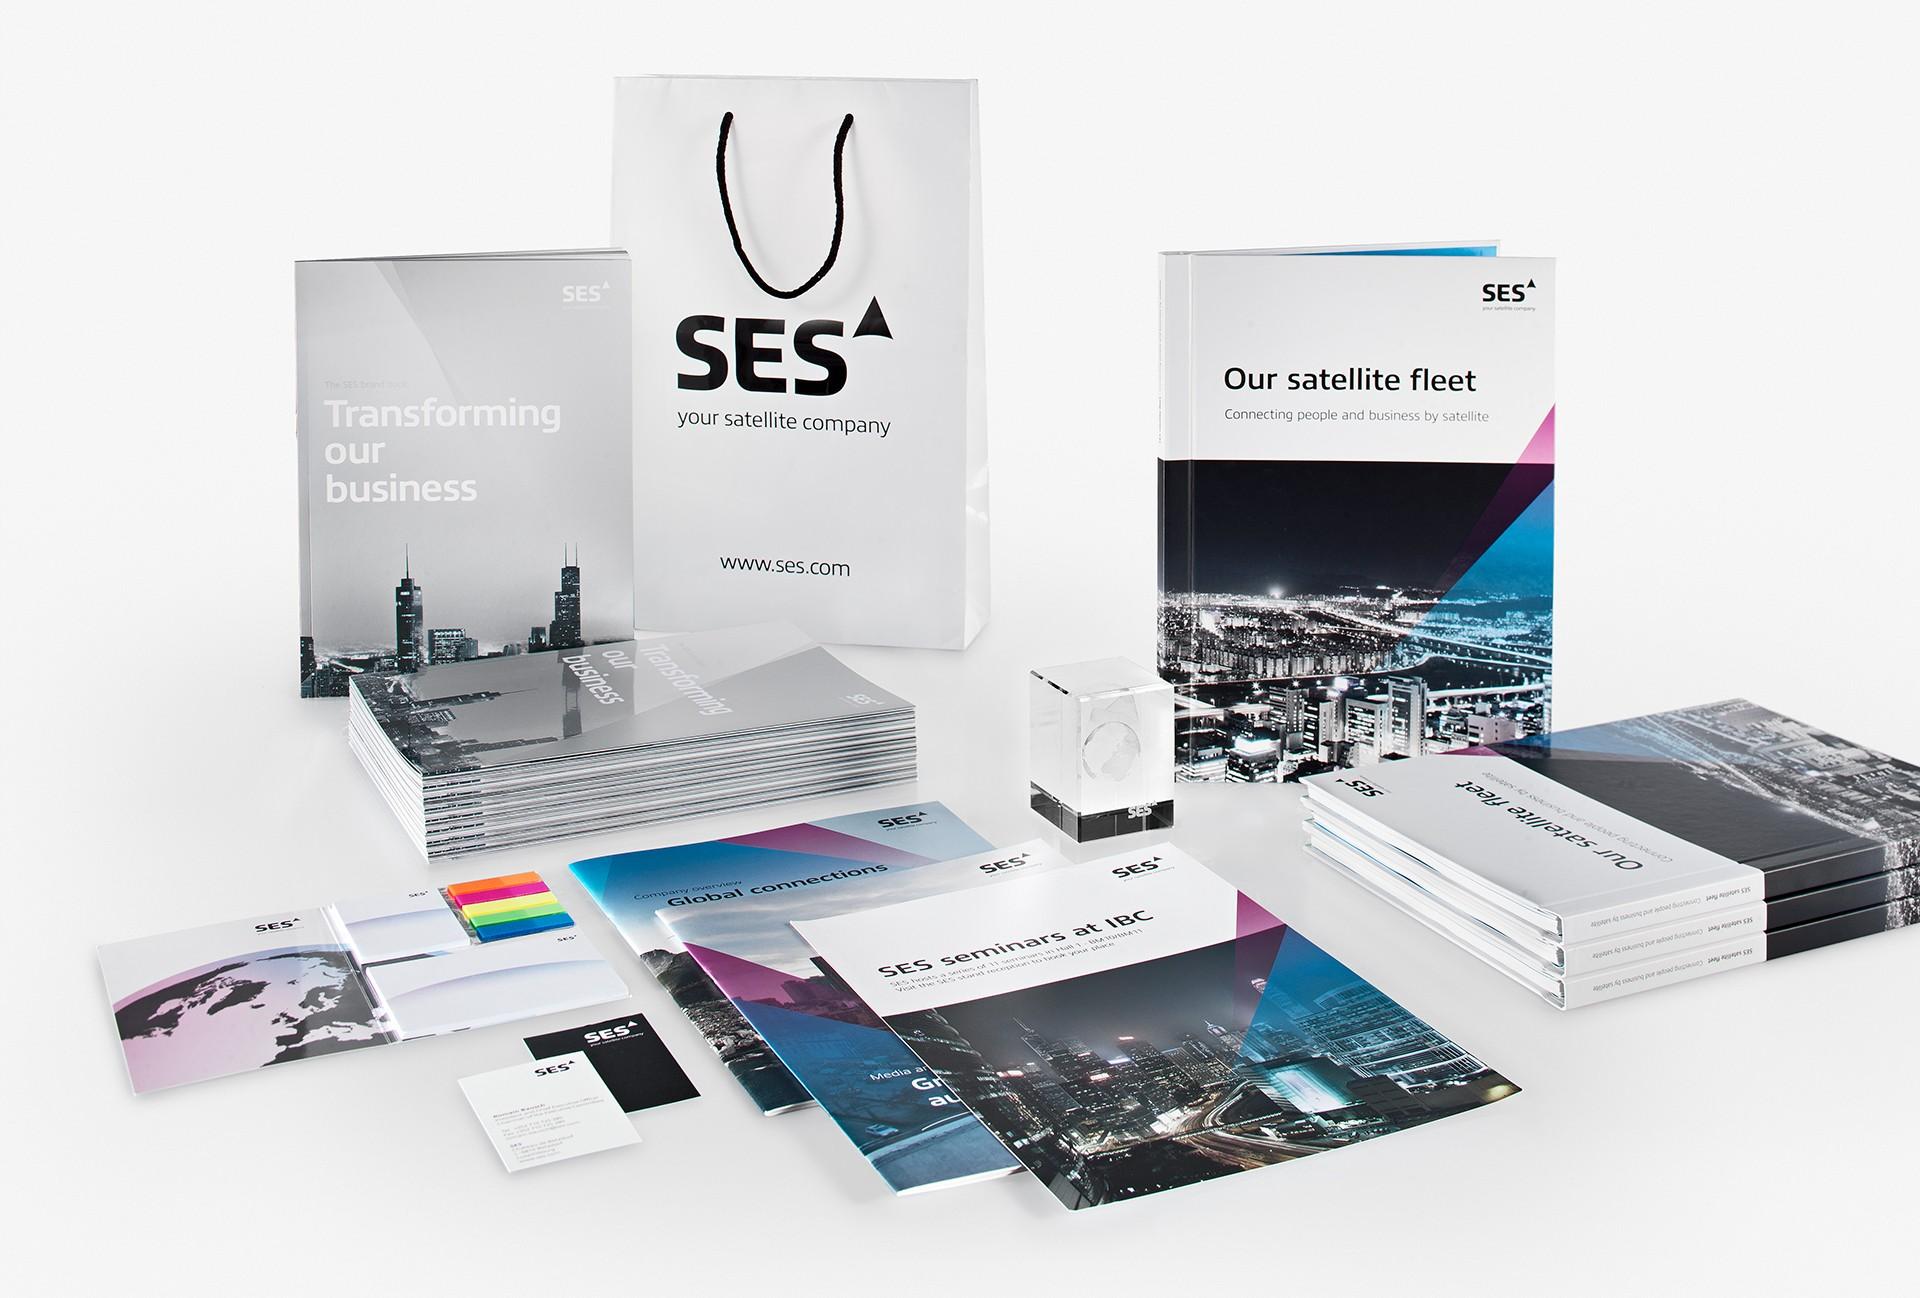 marcela grupp | design & creative direction SES – Satellite company